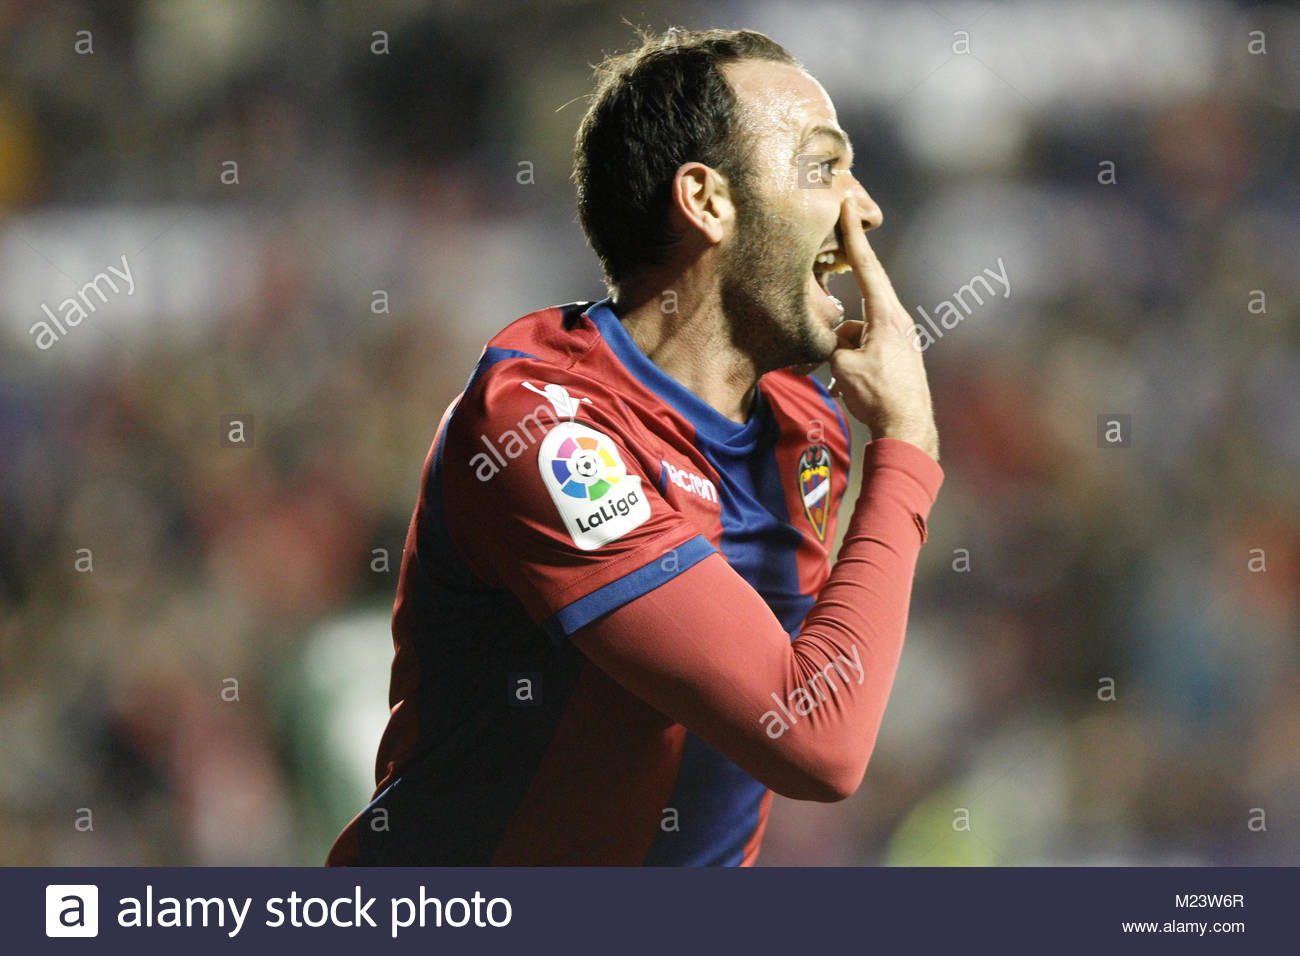 Levante's Pazzini celebrates after score his first goal during a matach Estadio Ciudad de Valencia versus Real - Stock Image